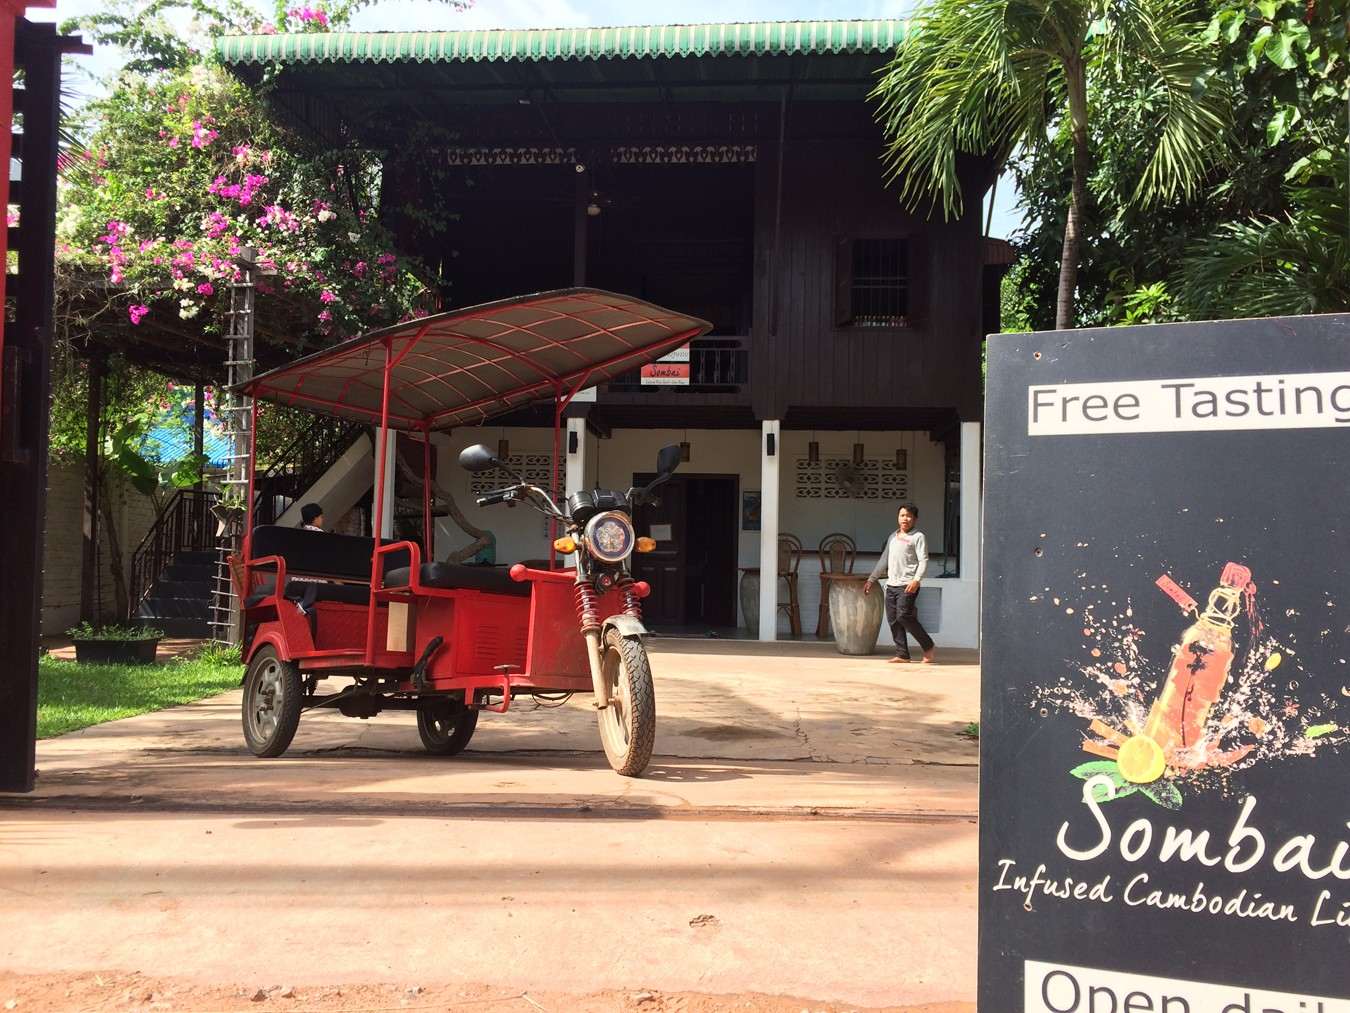 Free pick-up, free tasting of Sombai